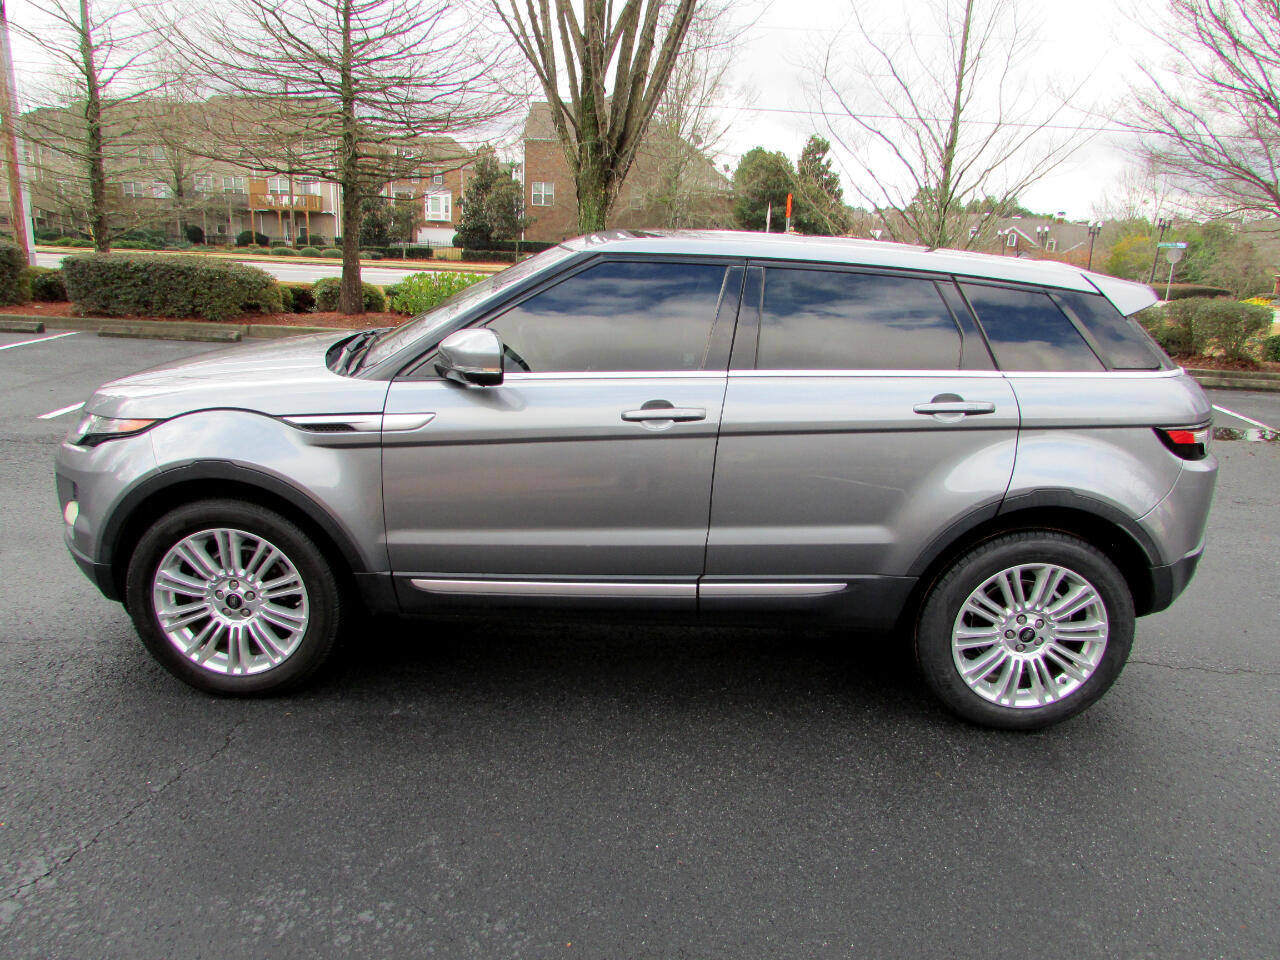 Land Rover Range Rover Evoque Prestige Premium 5-Door 2013